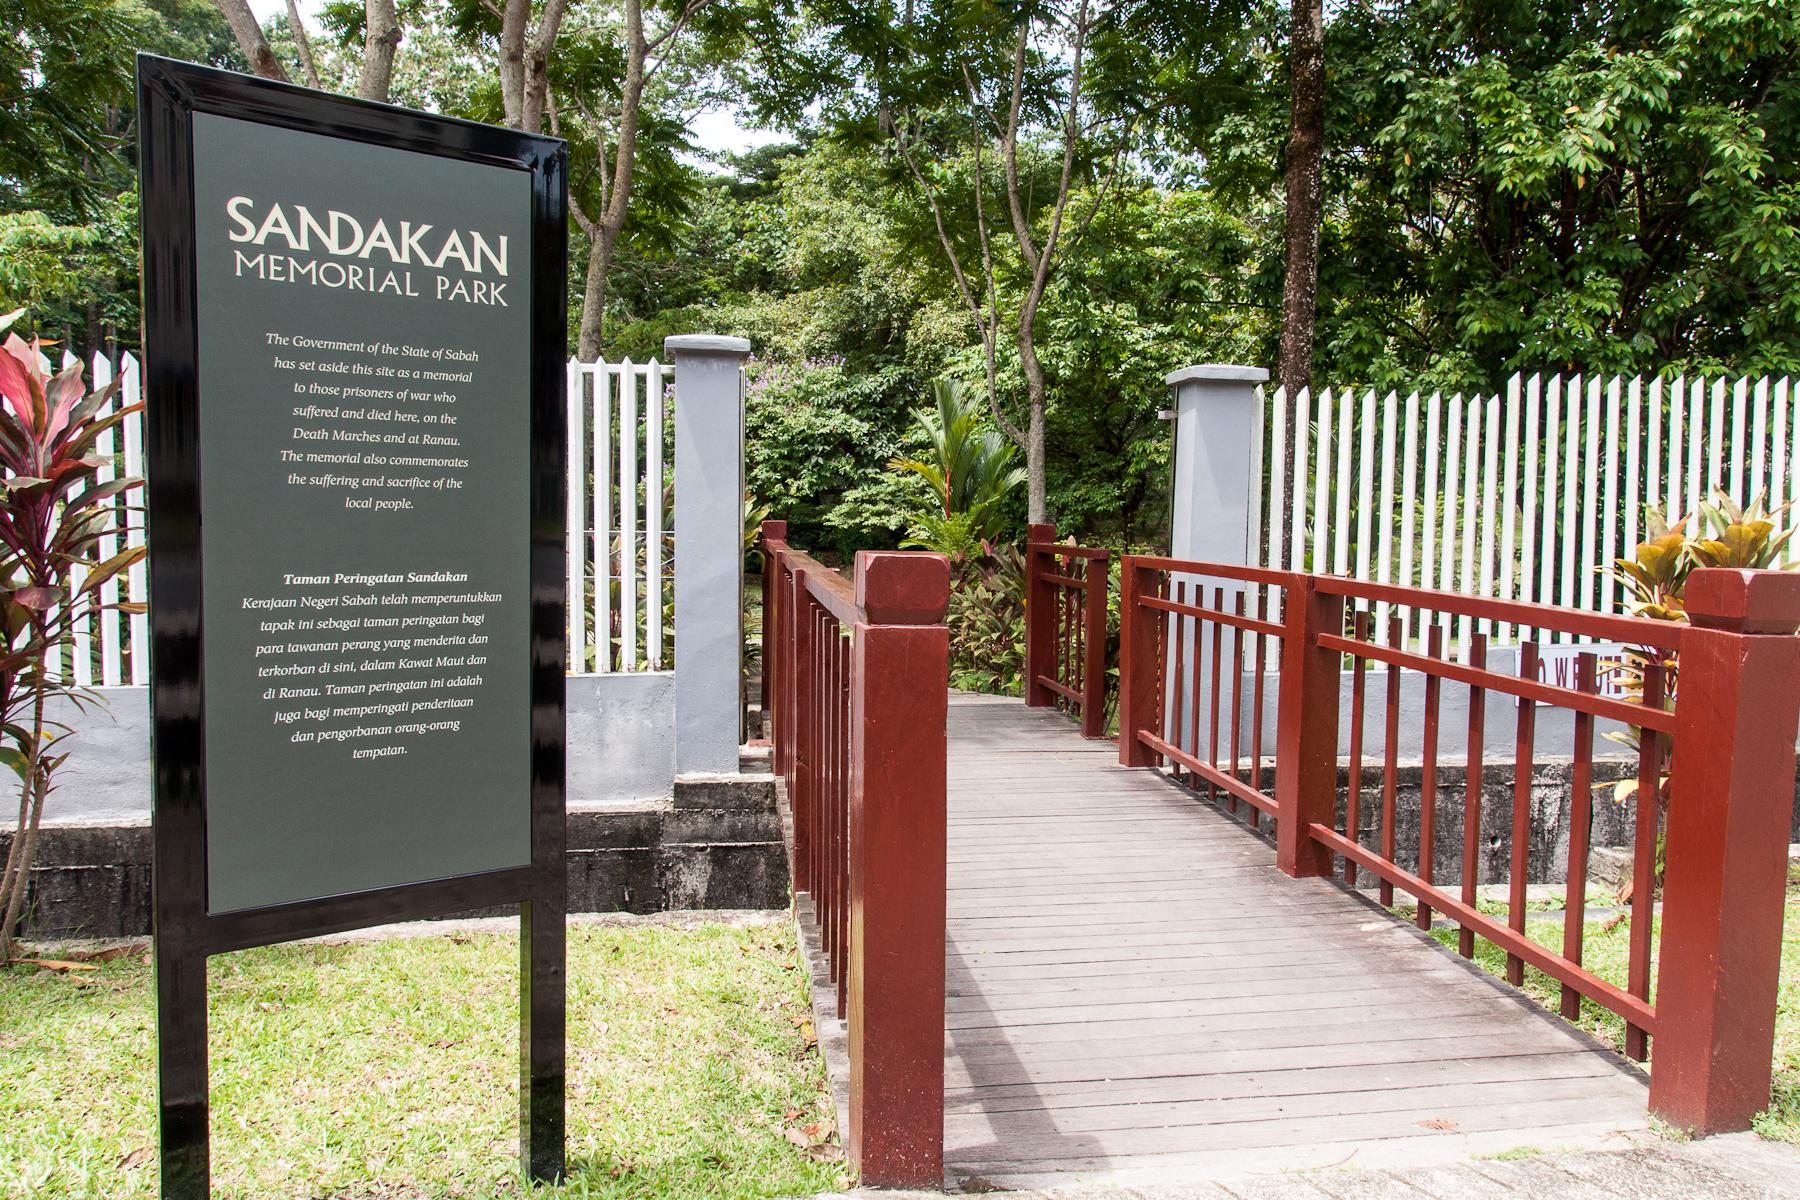 Sandakan Memorial Park - Wikipedia